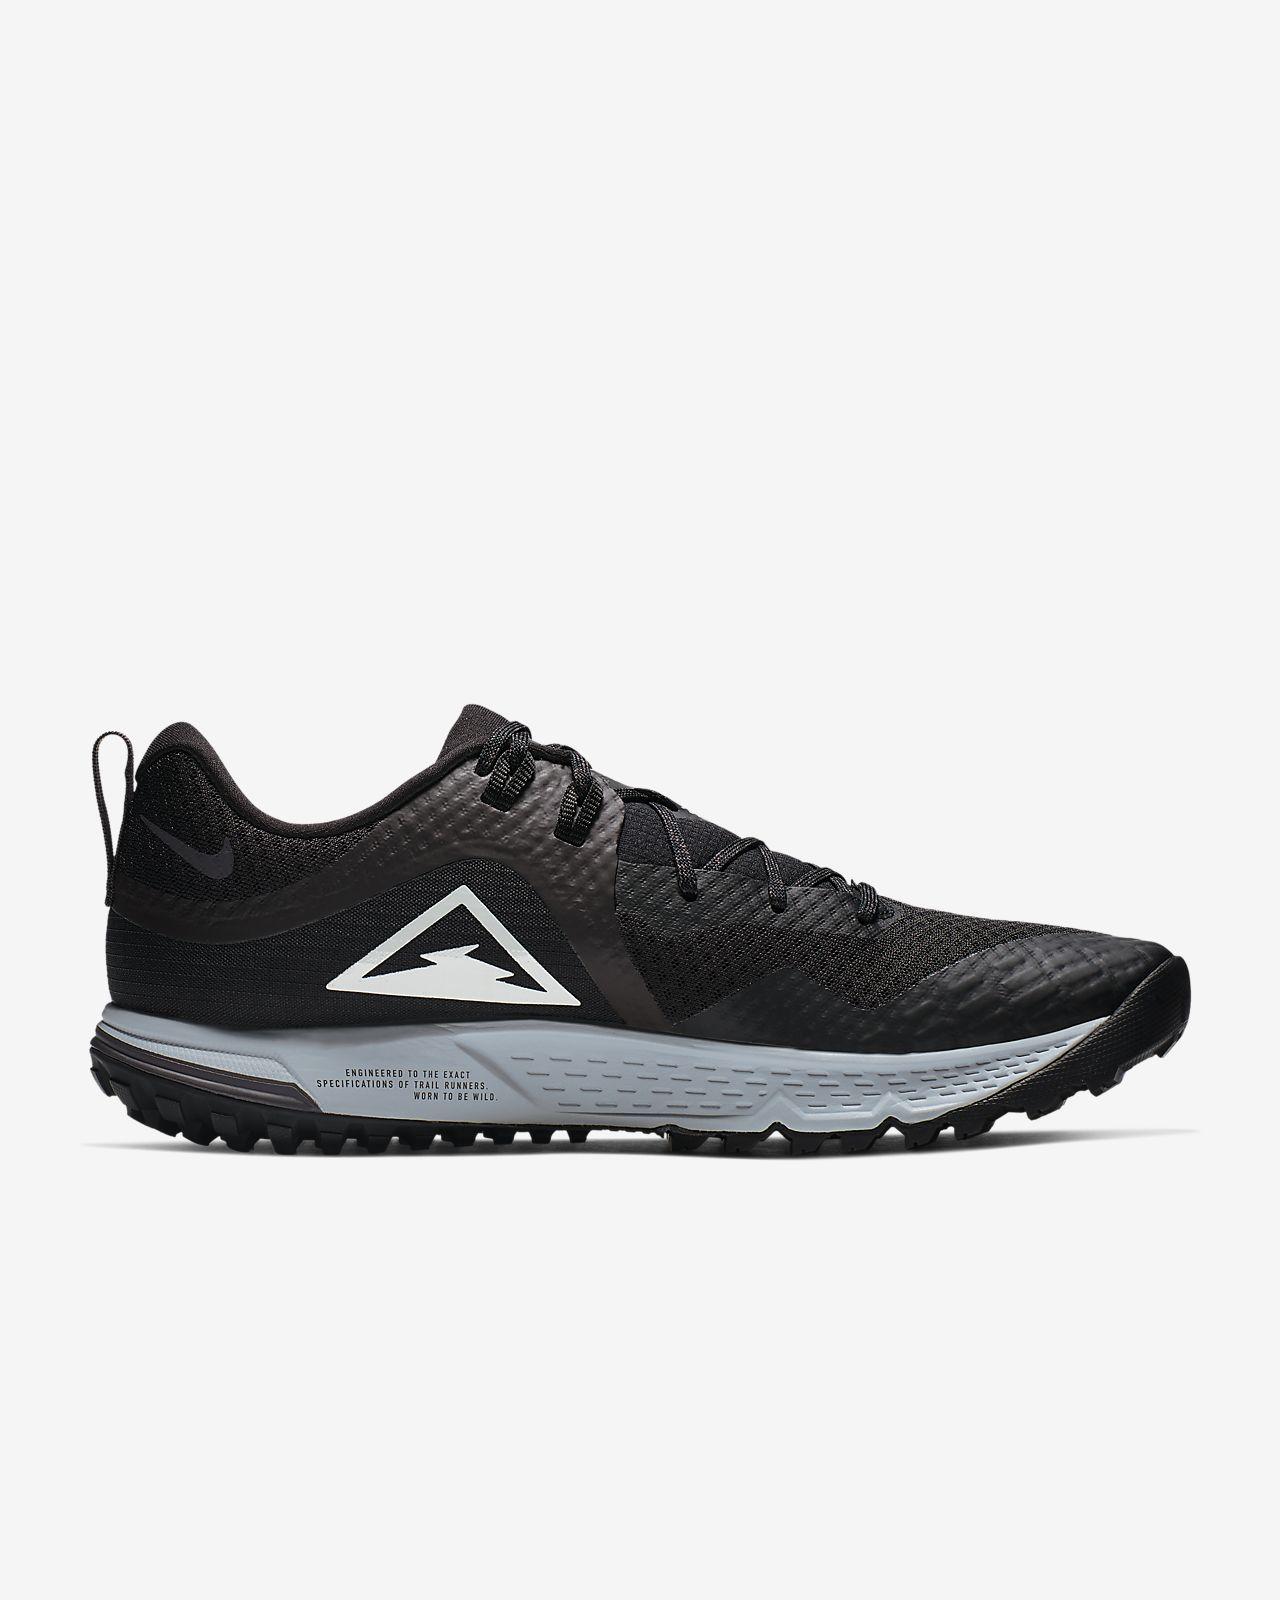 the best attitude 4172a ada82 ... Nike Air Zoom Wildhorse 5 Men s Running Shoe